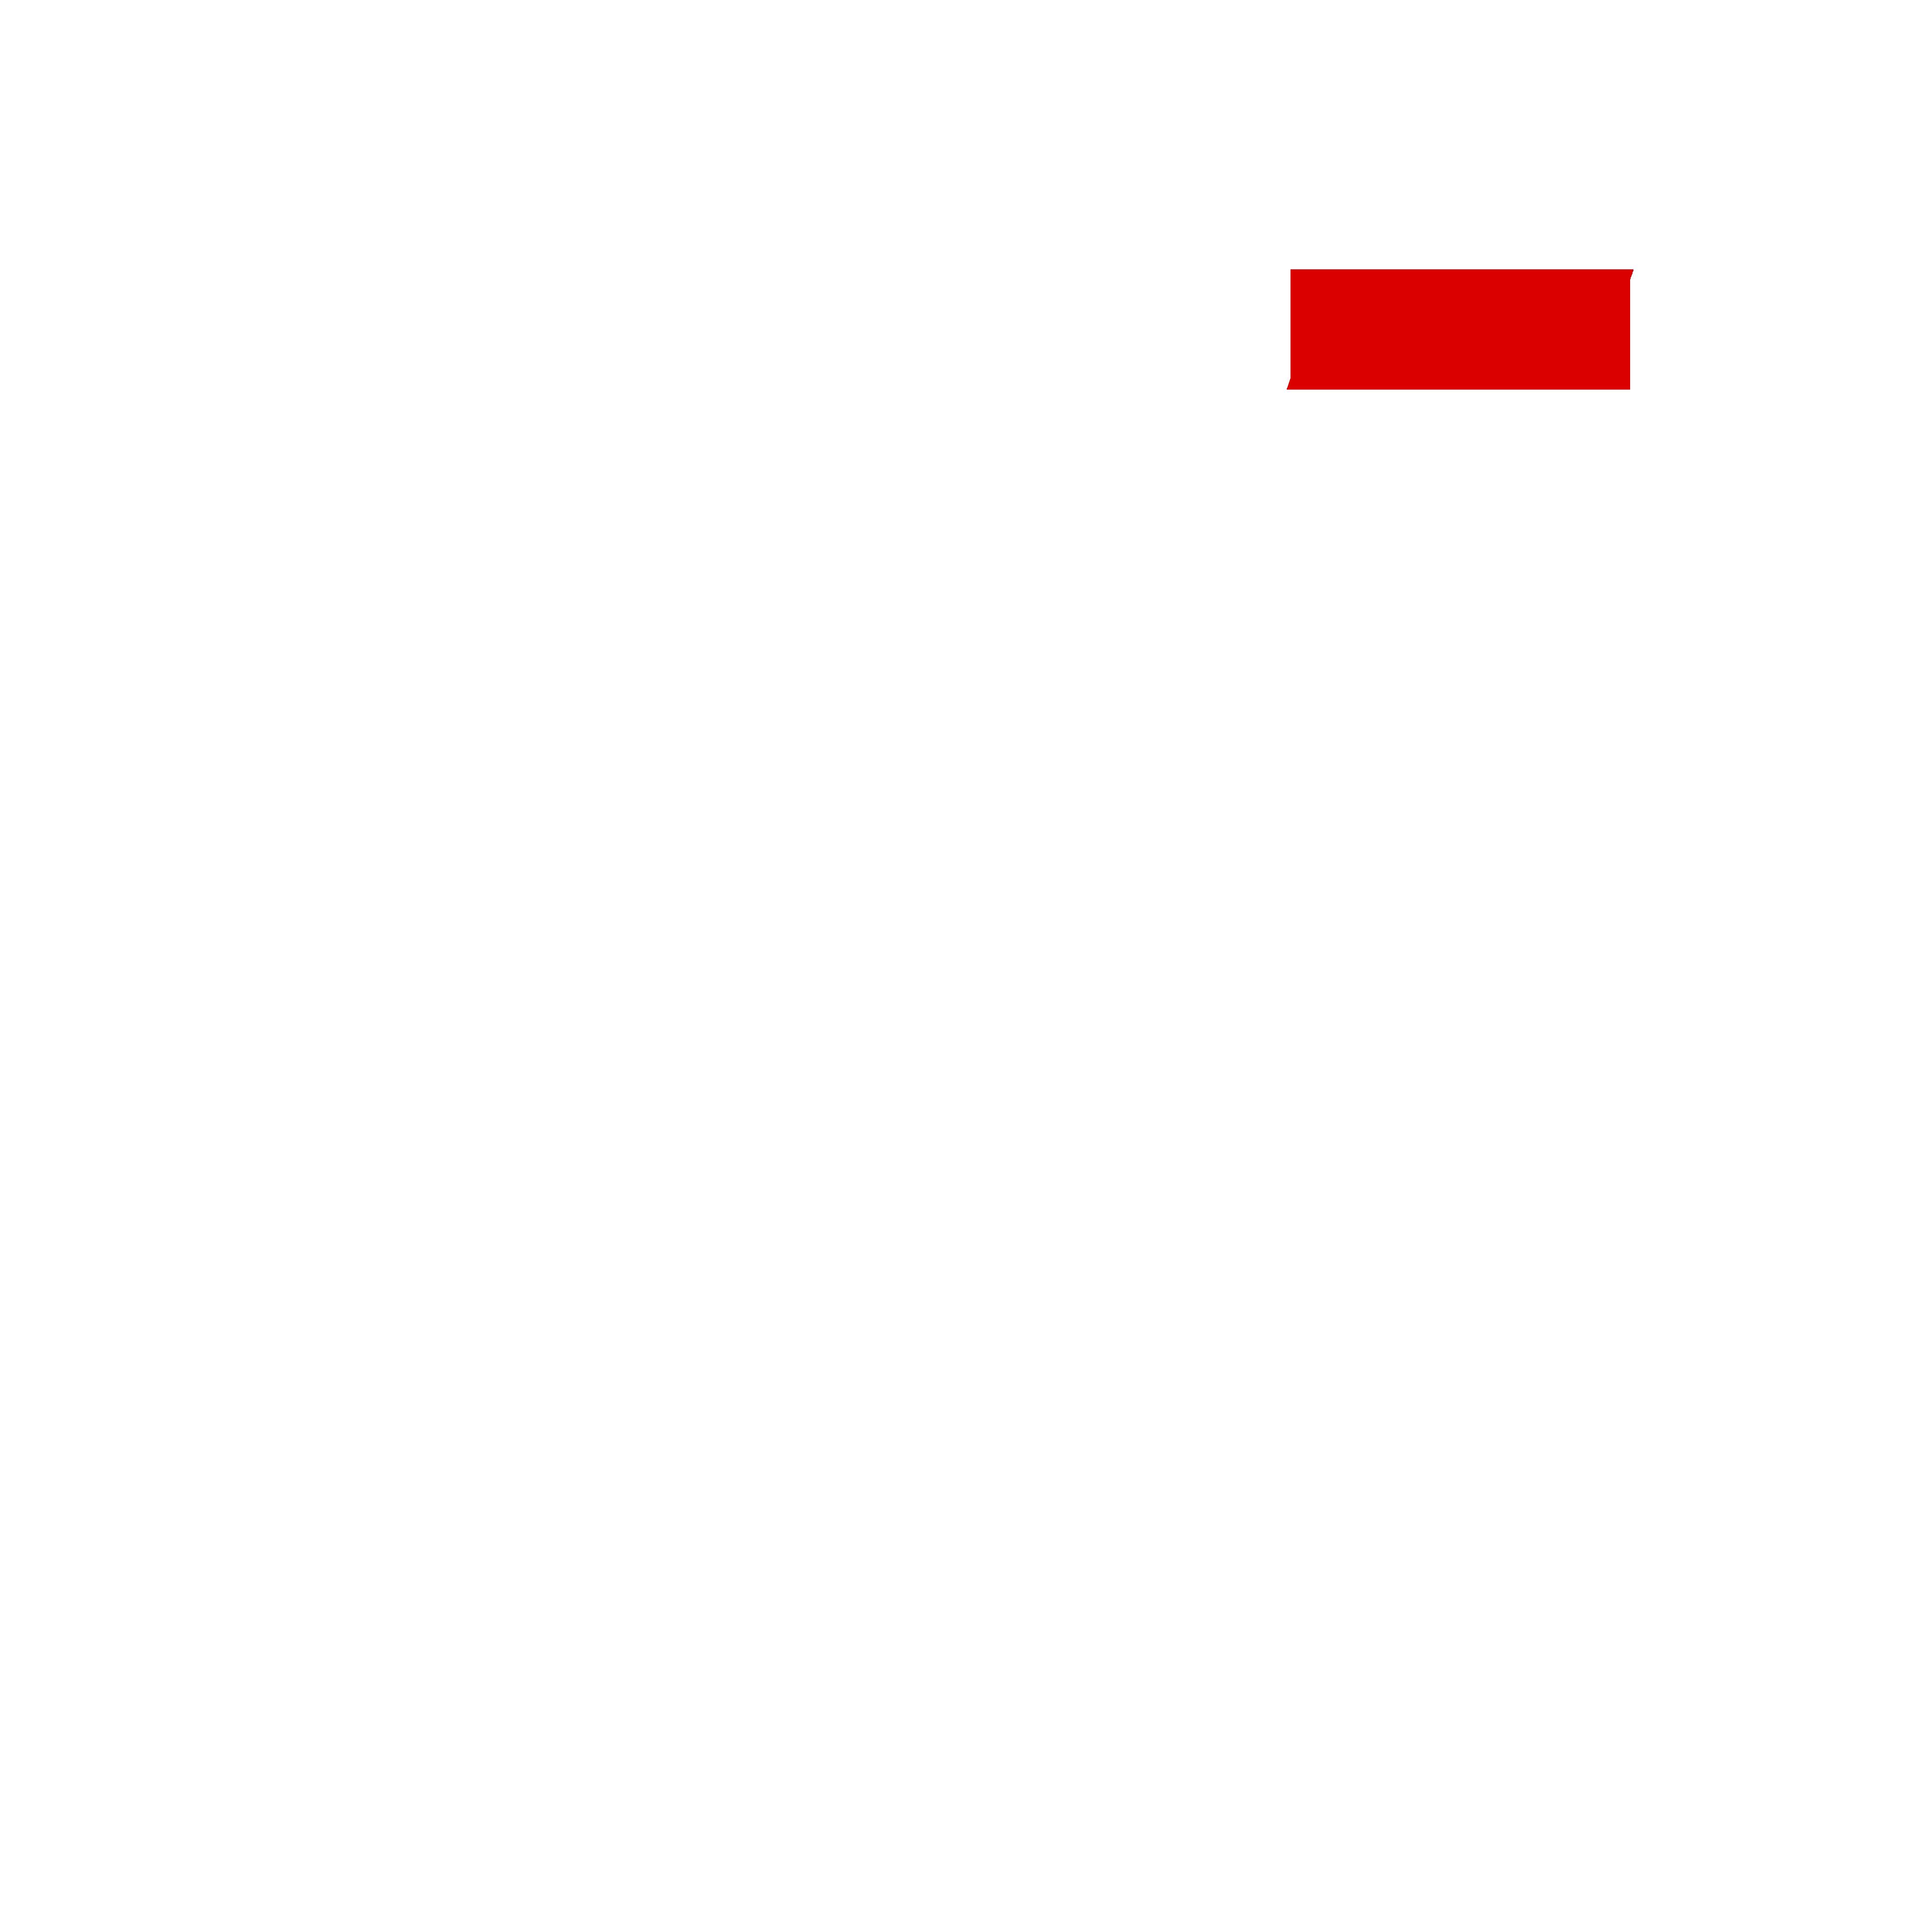 Jean-Noël Verfaillie